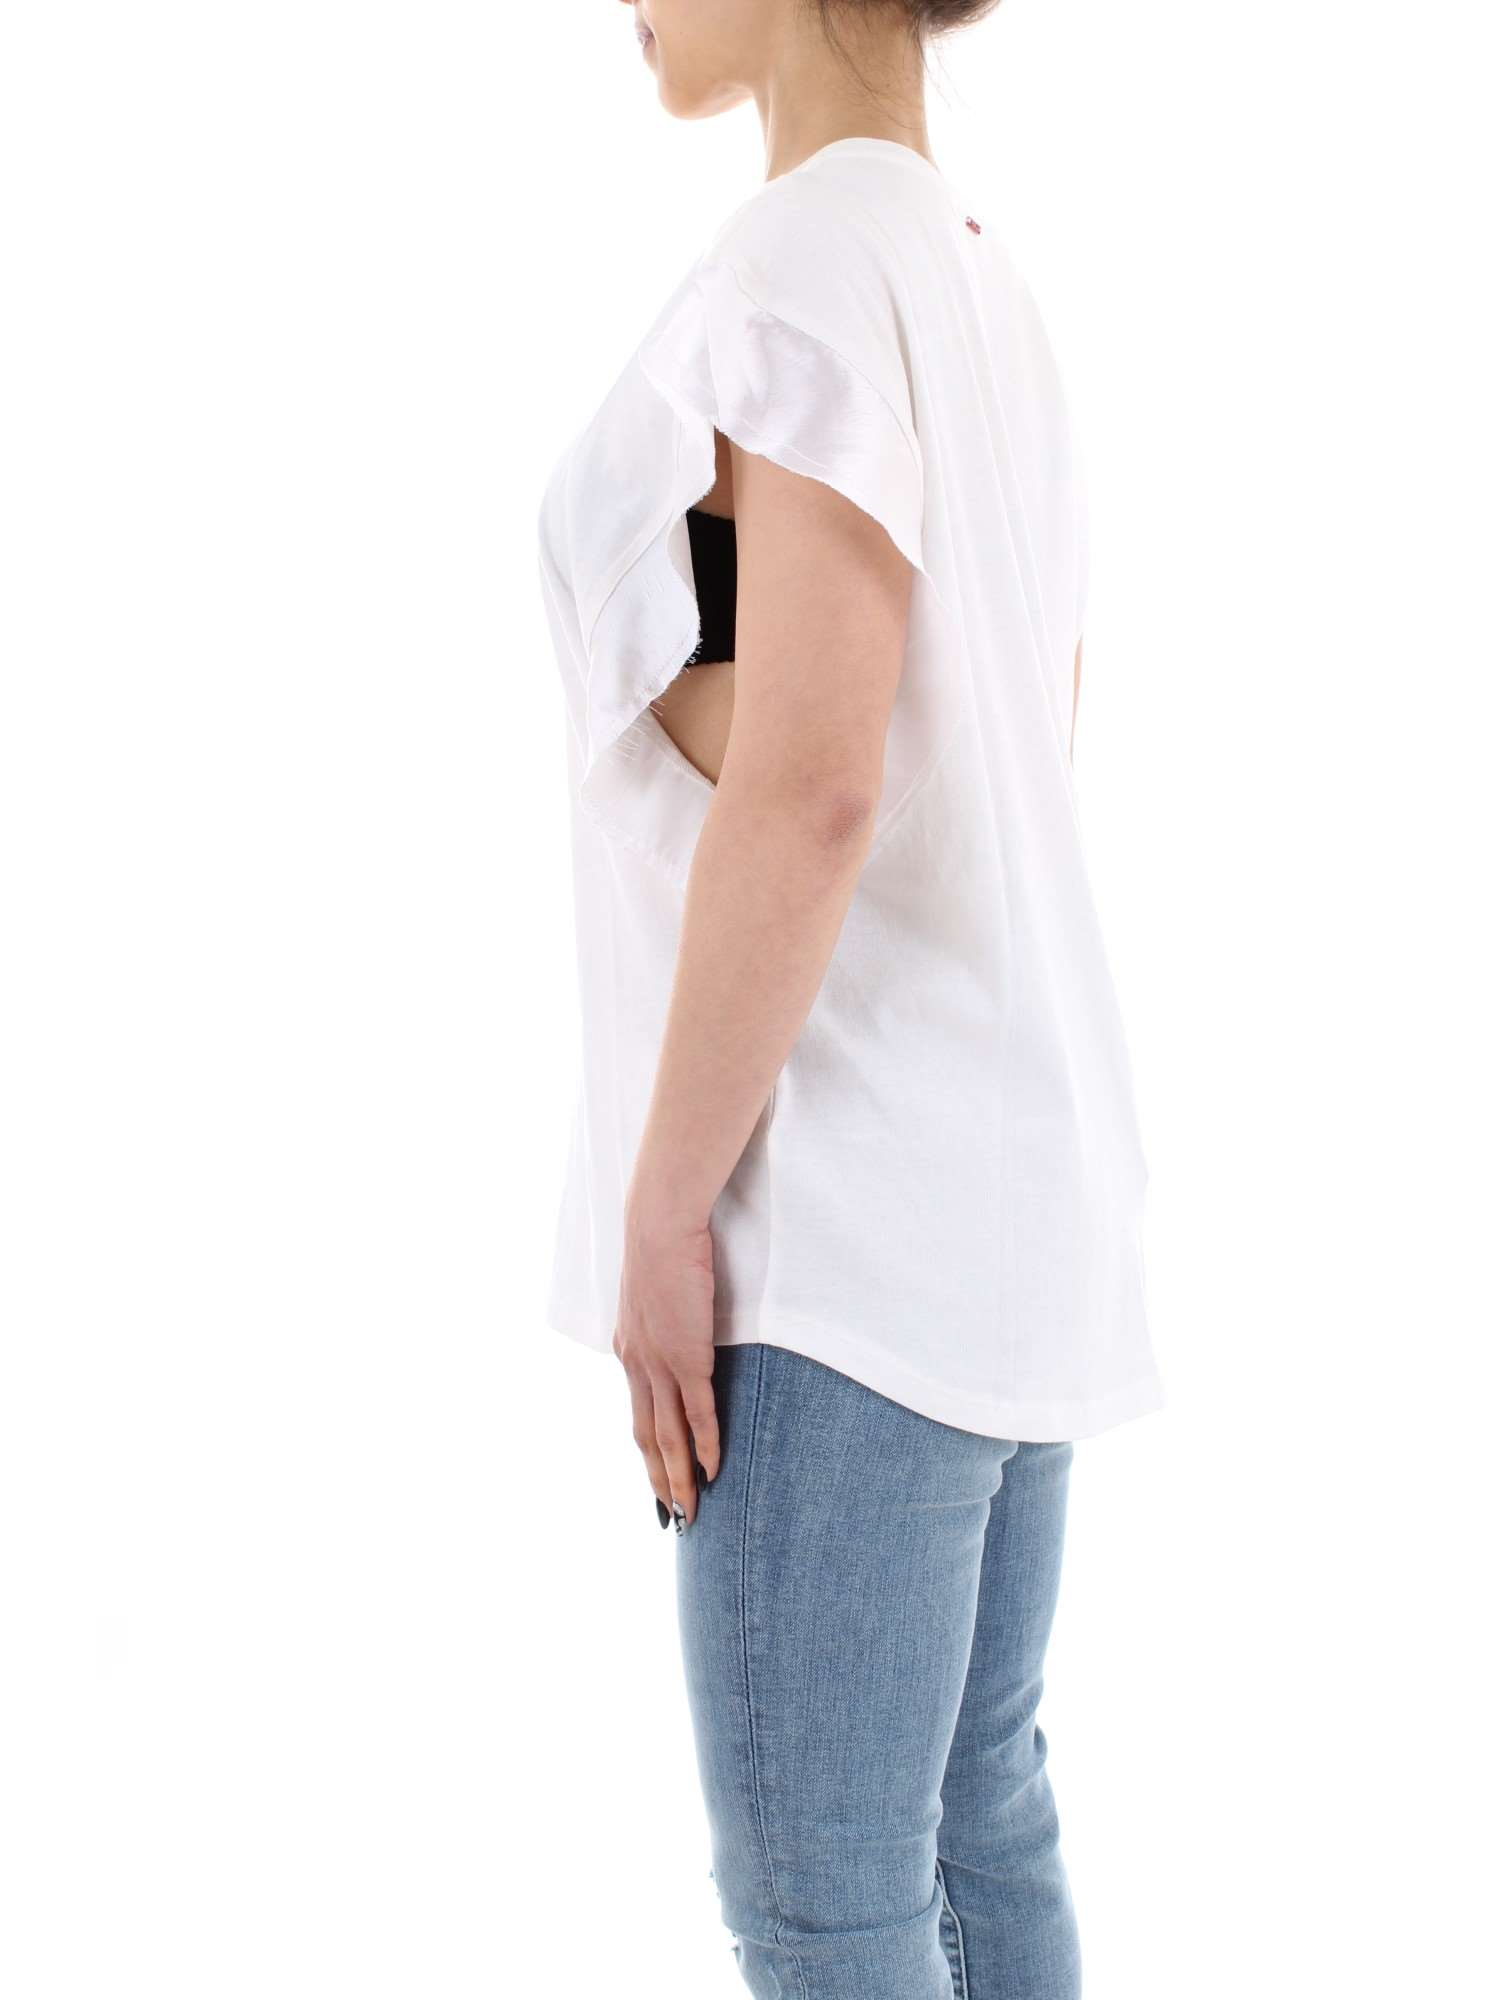 W3206 T Replay estate Primavera Bianca 22530p shirt 011 Donna 1wwHqd